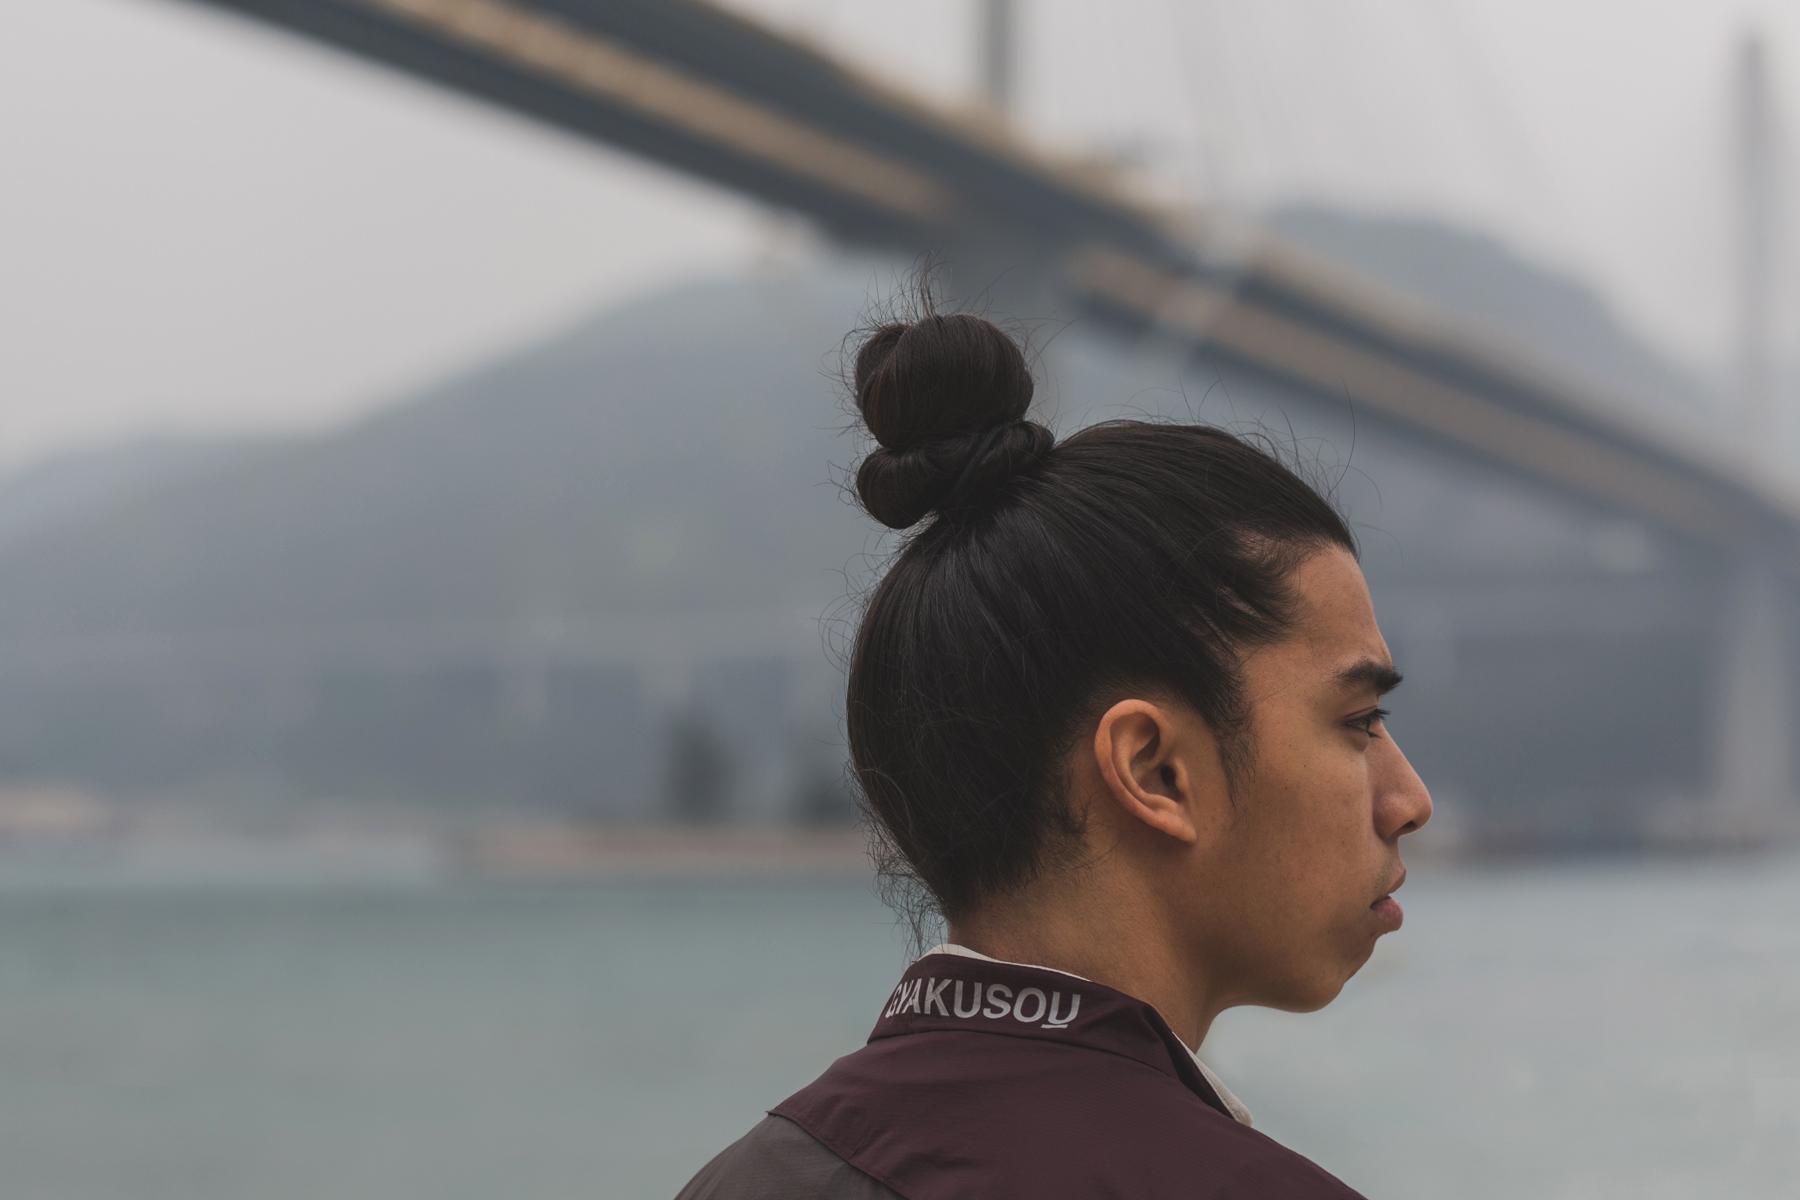 undercover x nike gyakusou 2014 spring summer yin yang editorial